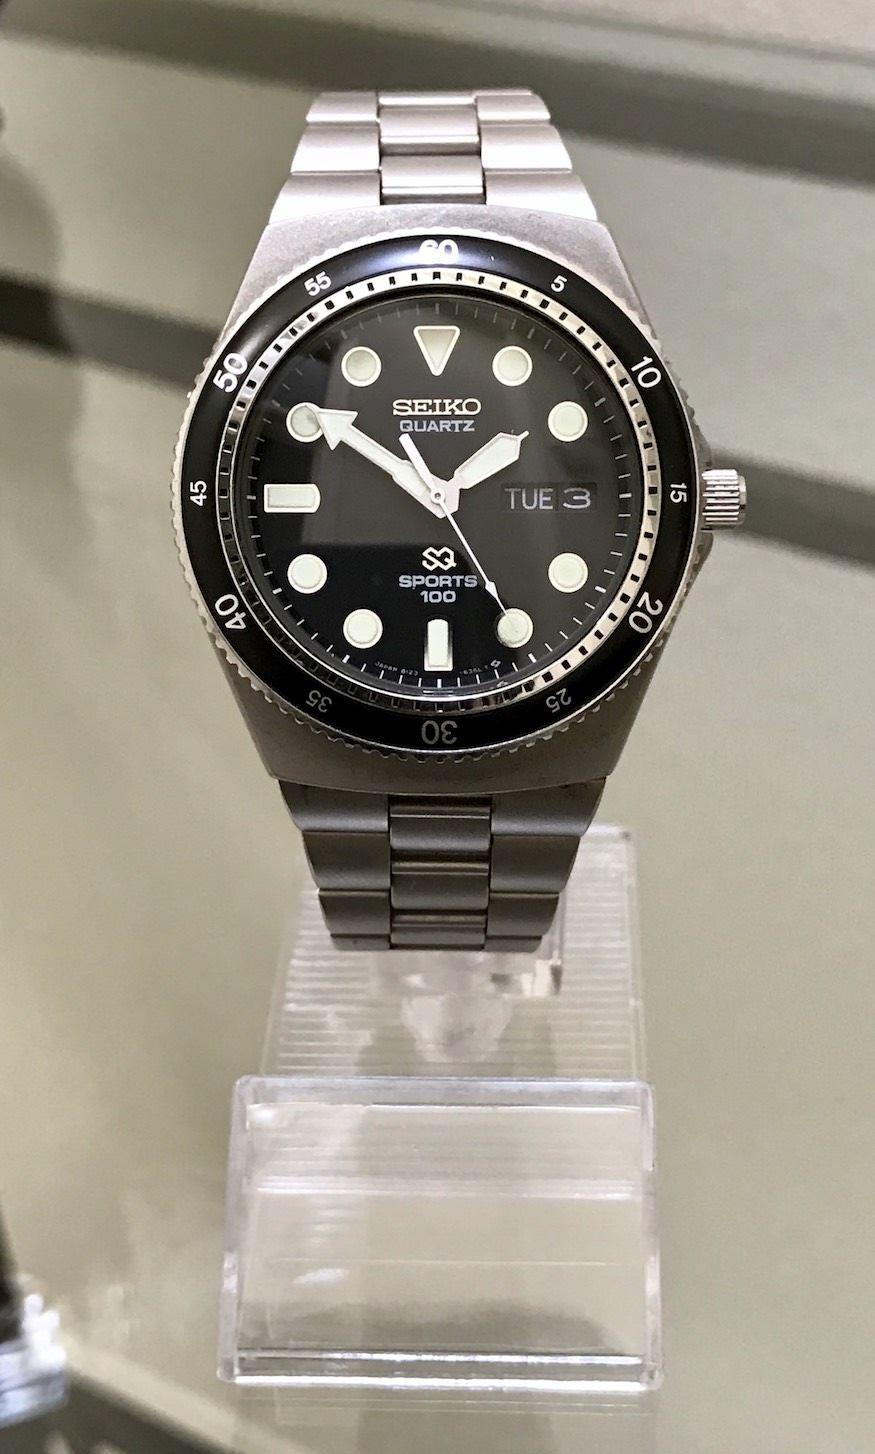 b77a1438928aca FS  Vintage Seiko 8123-6260 Sports 100 Quartz Diver  (newoldstockwatches gmail.com)